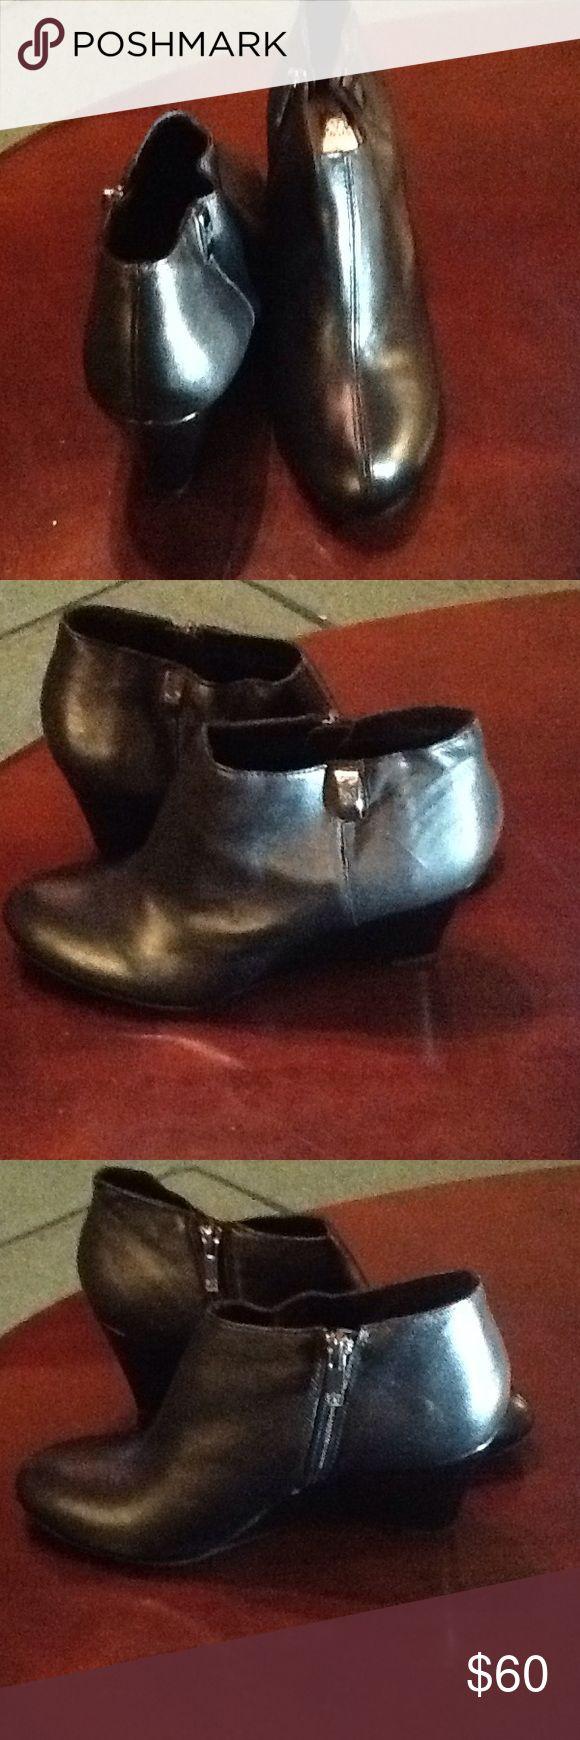 ANNE KLIEN BLACK PLATFORM ANKLE BOOTS ANNE KLIEN BLACK PLATFORM ANKLE BOOTS SIZE 9.5M NEW WITH BOX Anne Klein Shoes Ankle Boots & Booties